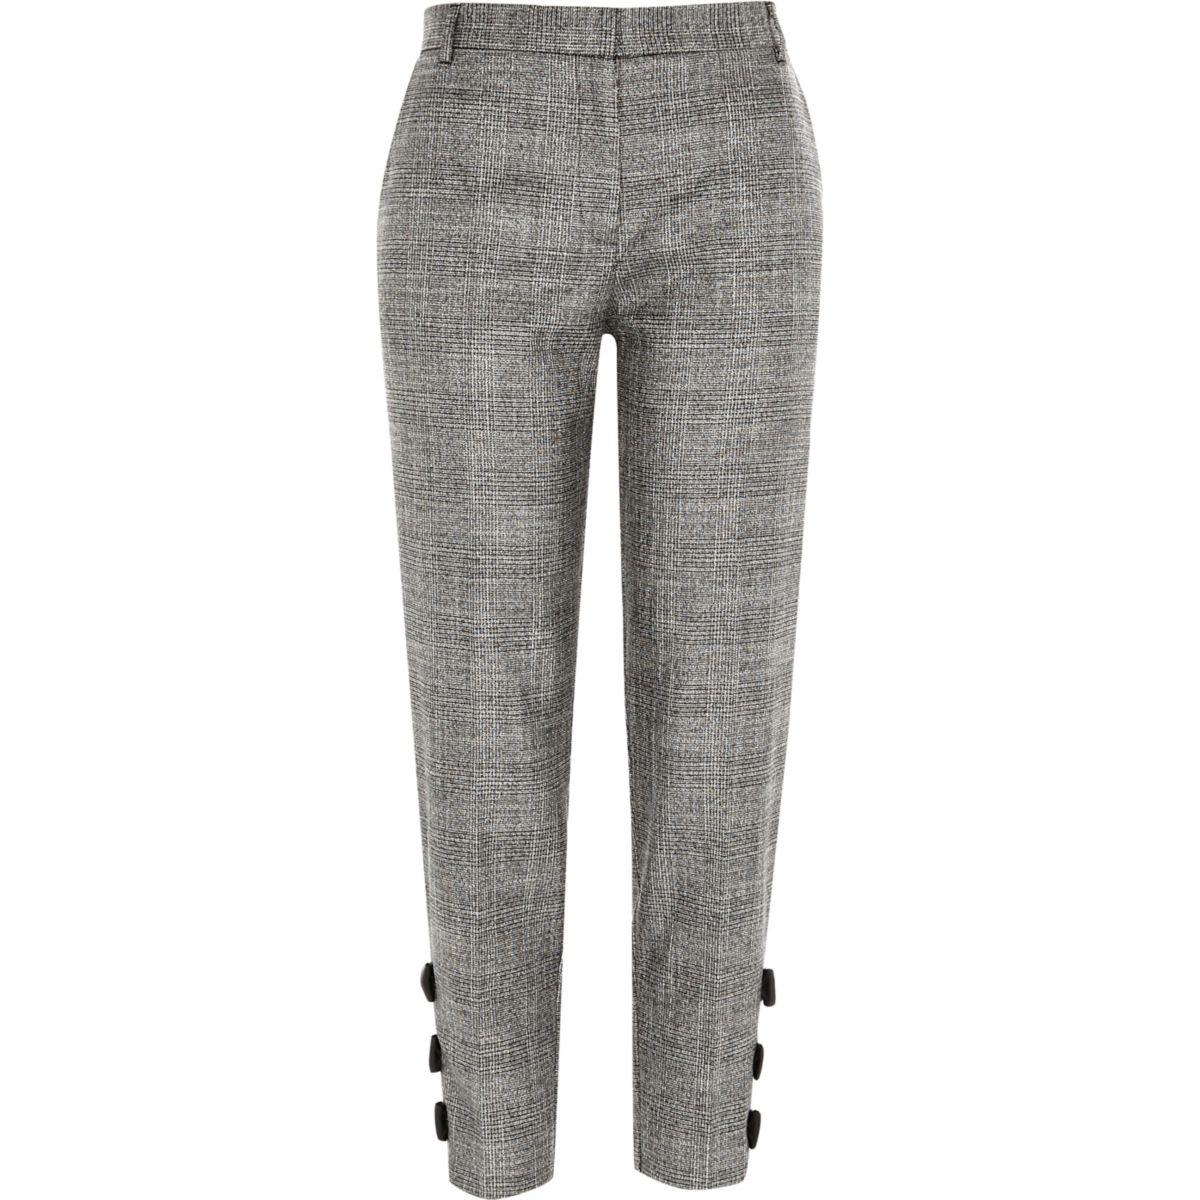 Grey check bow hem cigarette pants